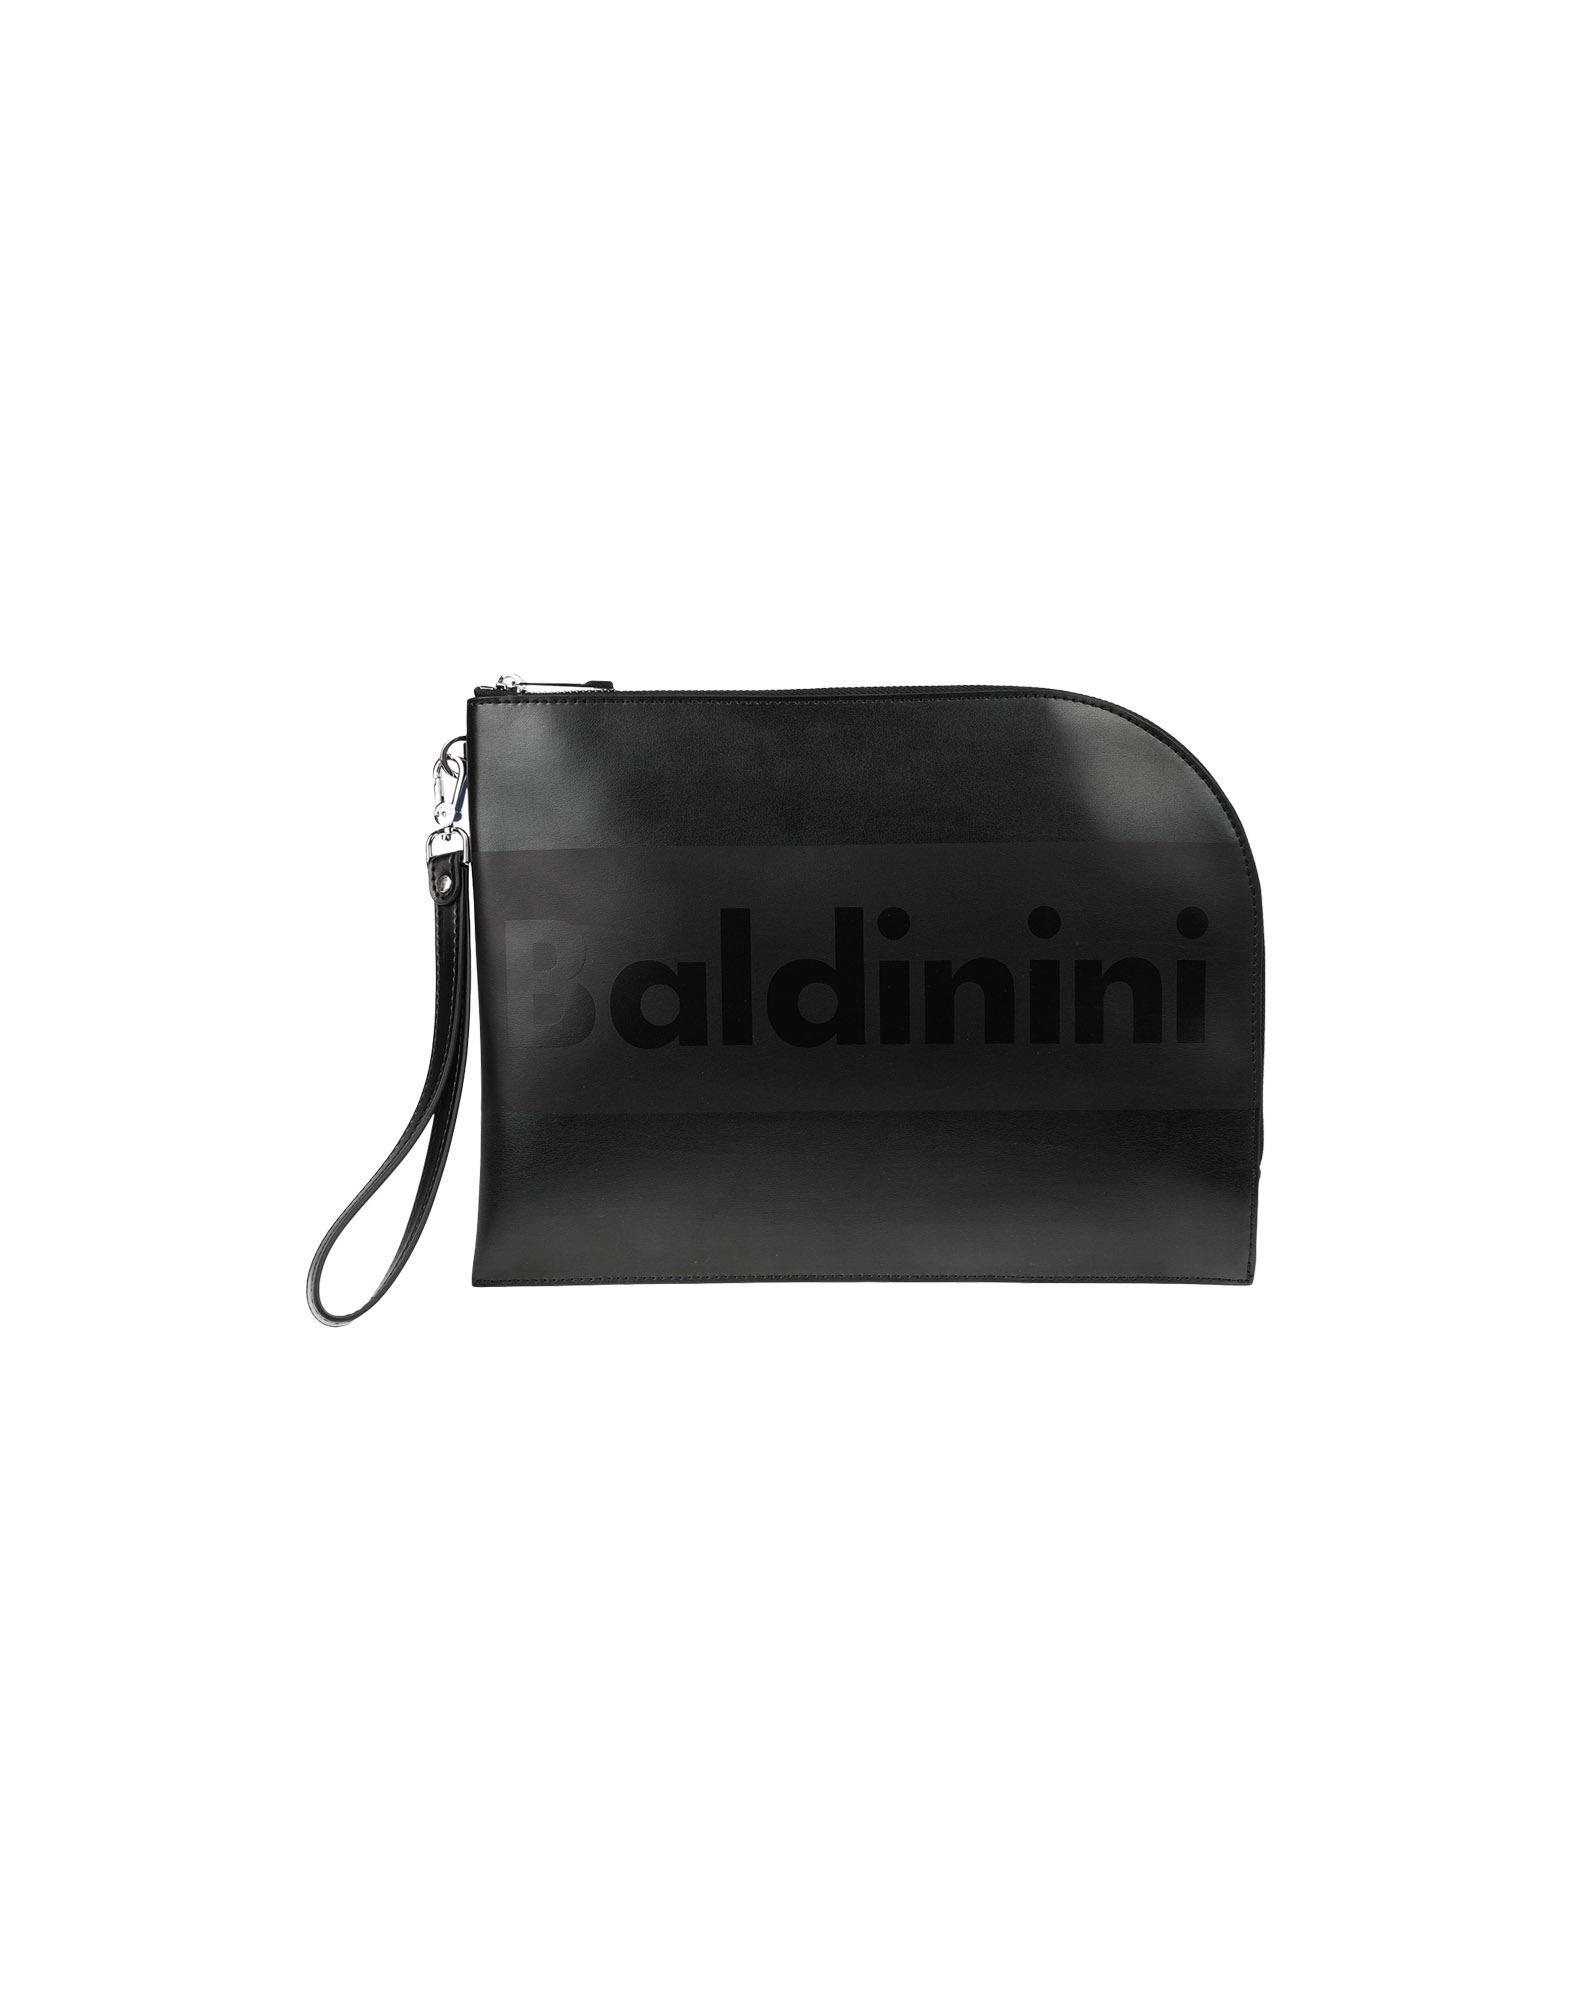 dunhill деловые сумки BALDININI Деловые сумки